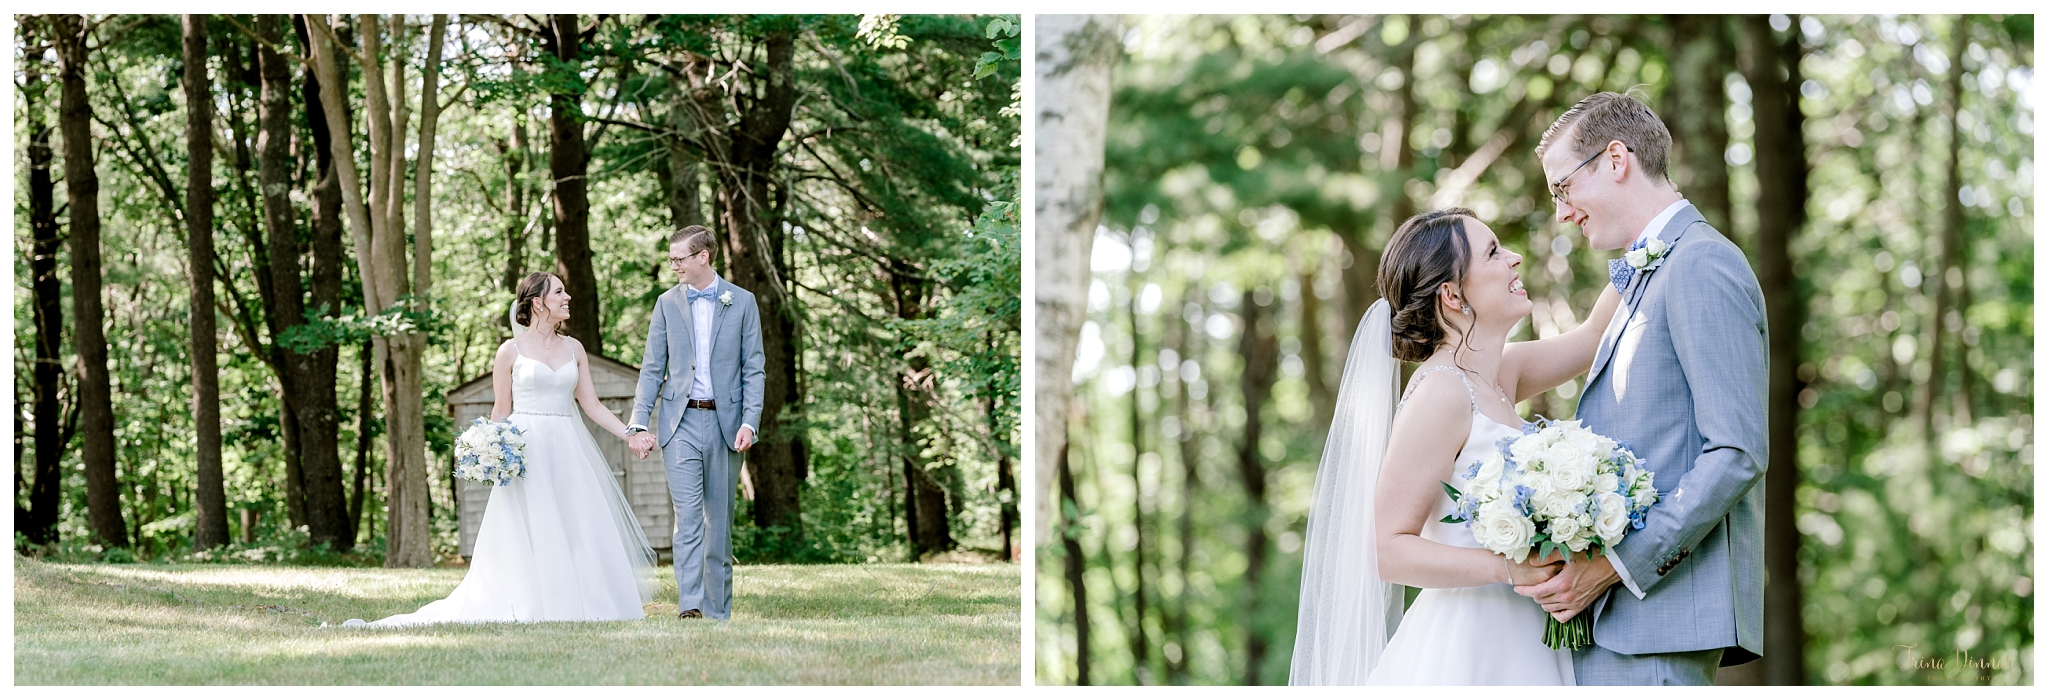 Megan and Hugh's Wedding